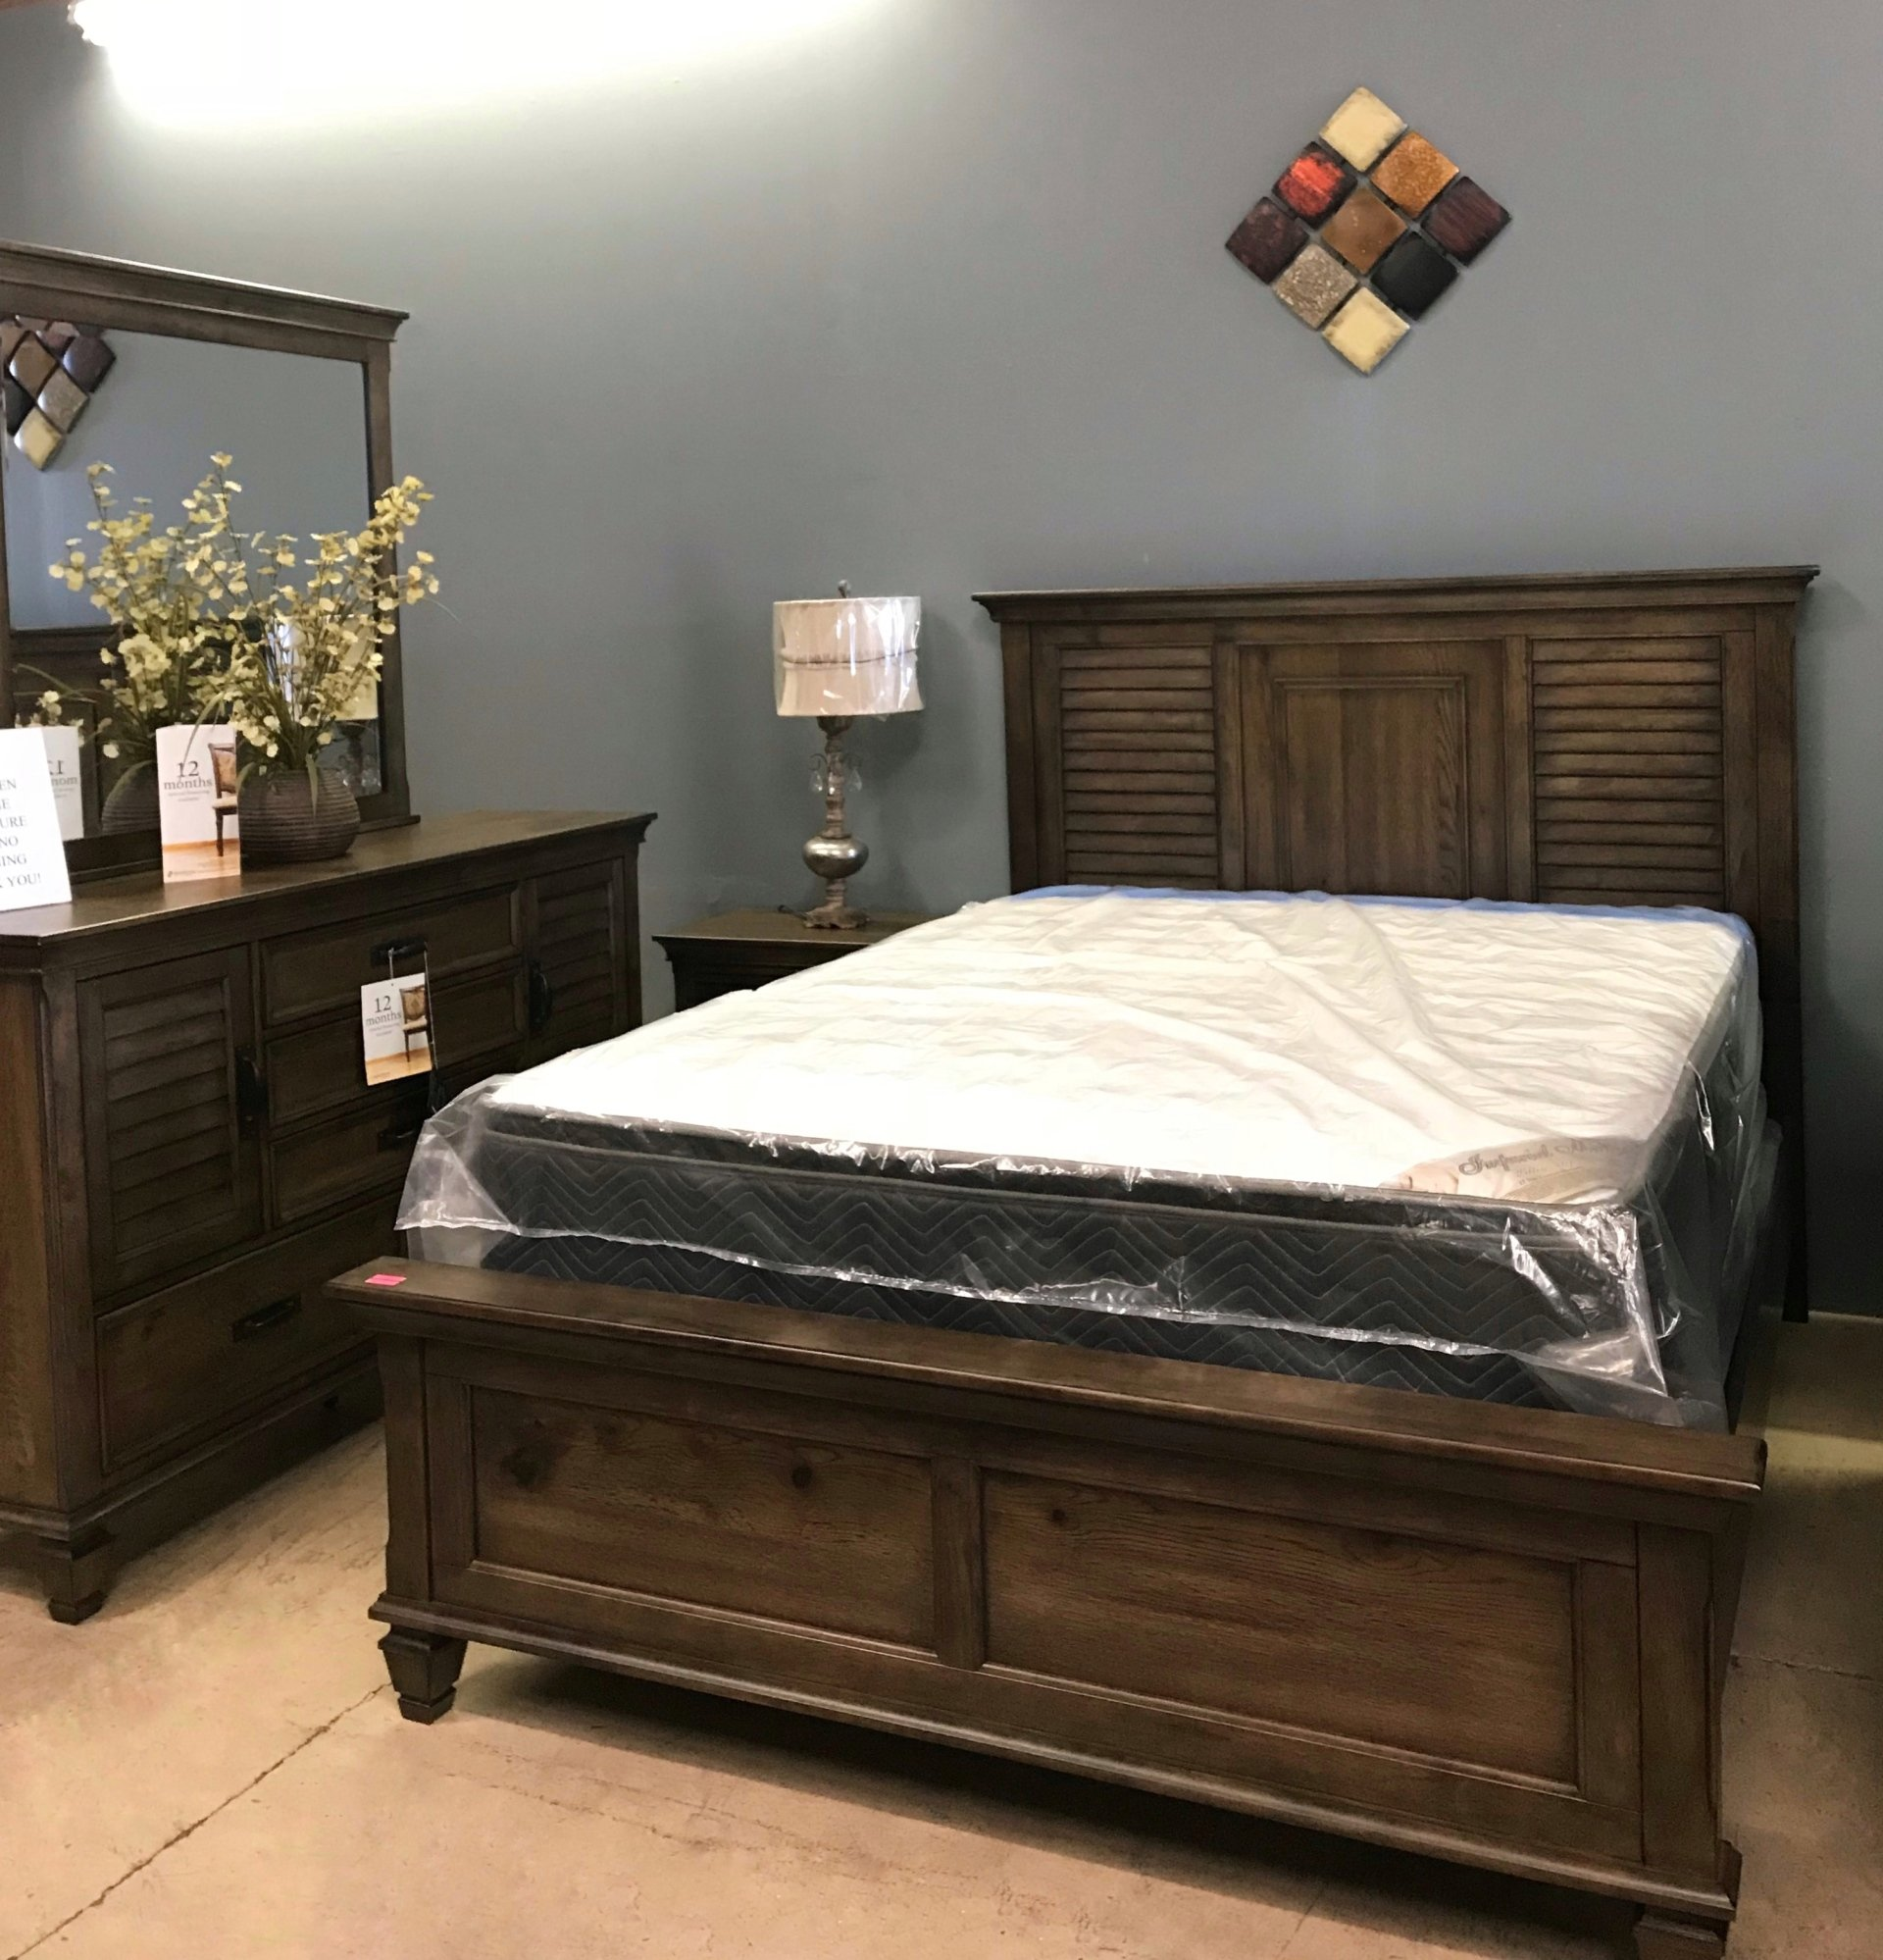 Furniture Clearance Sacramento: Bargain Bedroom Sets & Mattresses